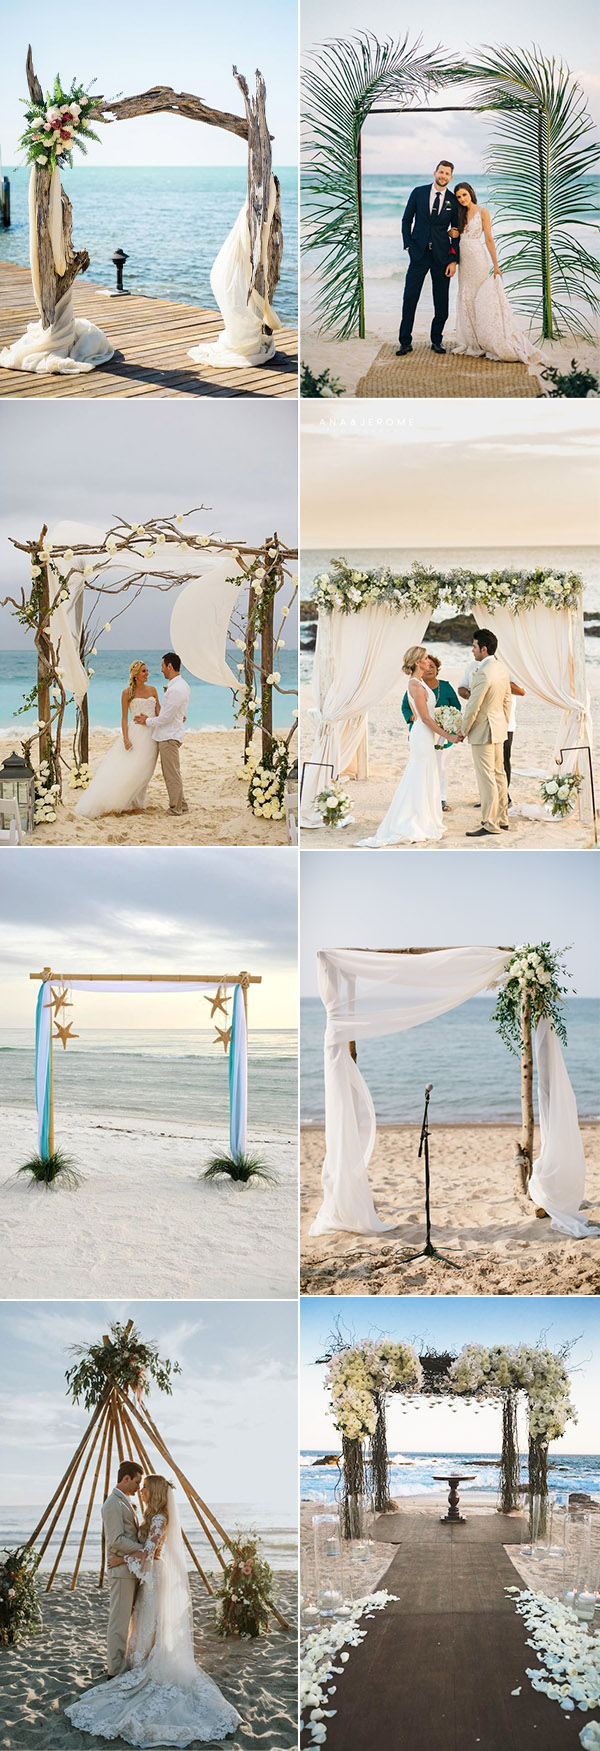 Beach Wedding Ideas 35 Gorgeous Beach Themed Wedding Ideas Elegantweddinginvites Blog